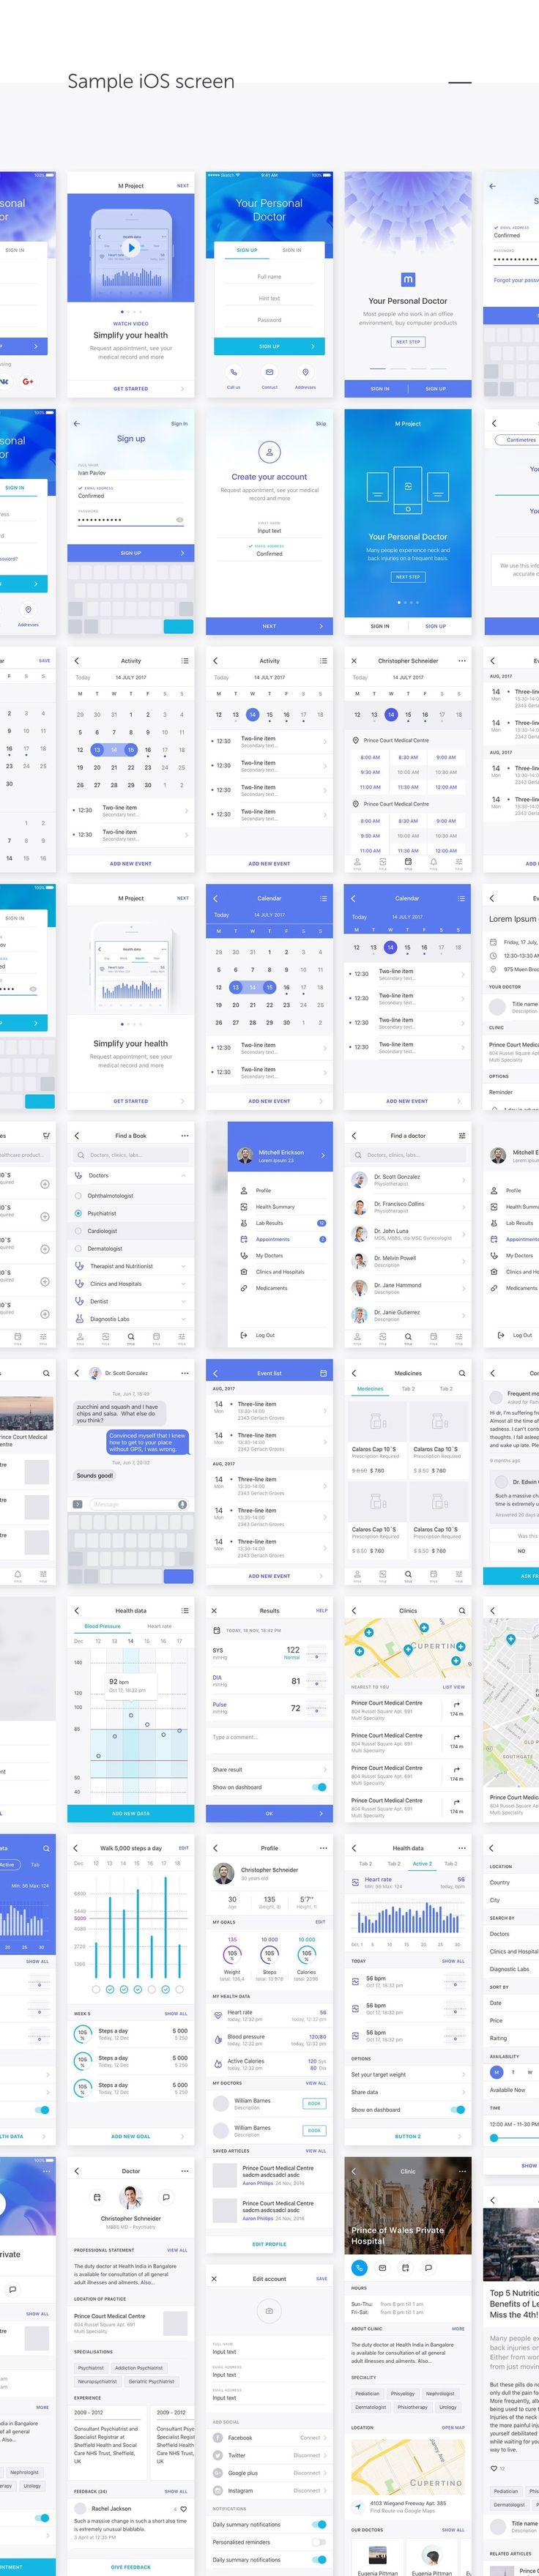 Medical & Healthcare iOS UI Kit on Behance